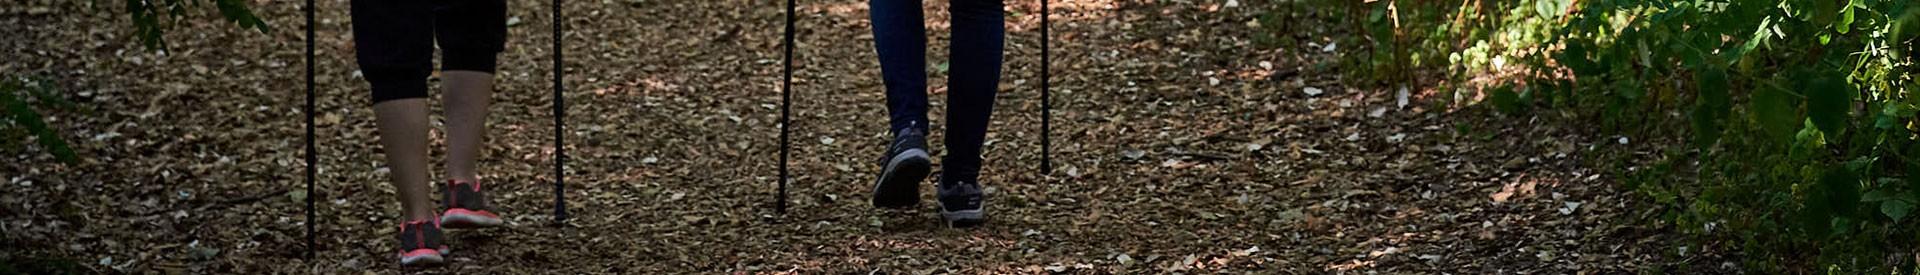 rando-pedestre-1655